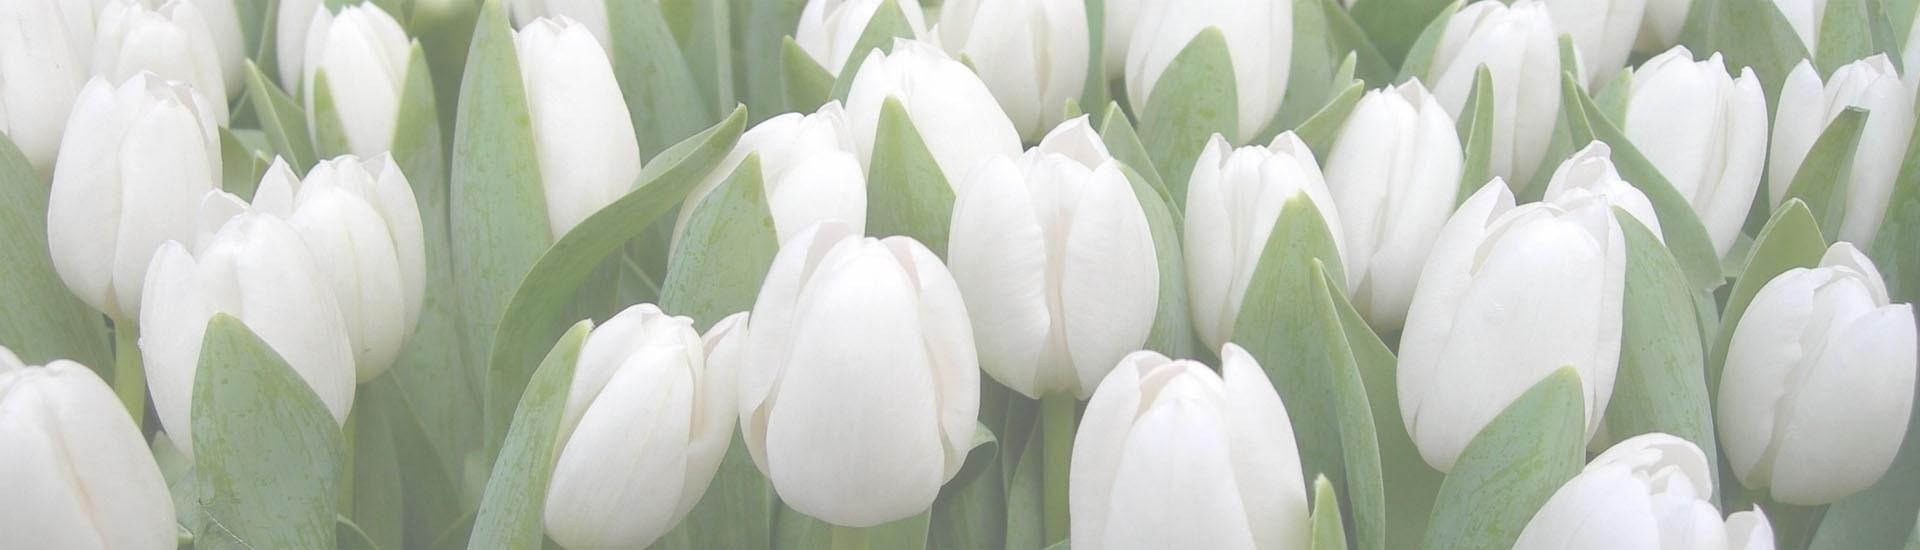 Floricultura Mel Flores - Banner tulipas